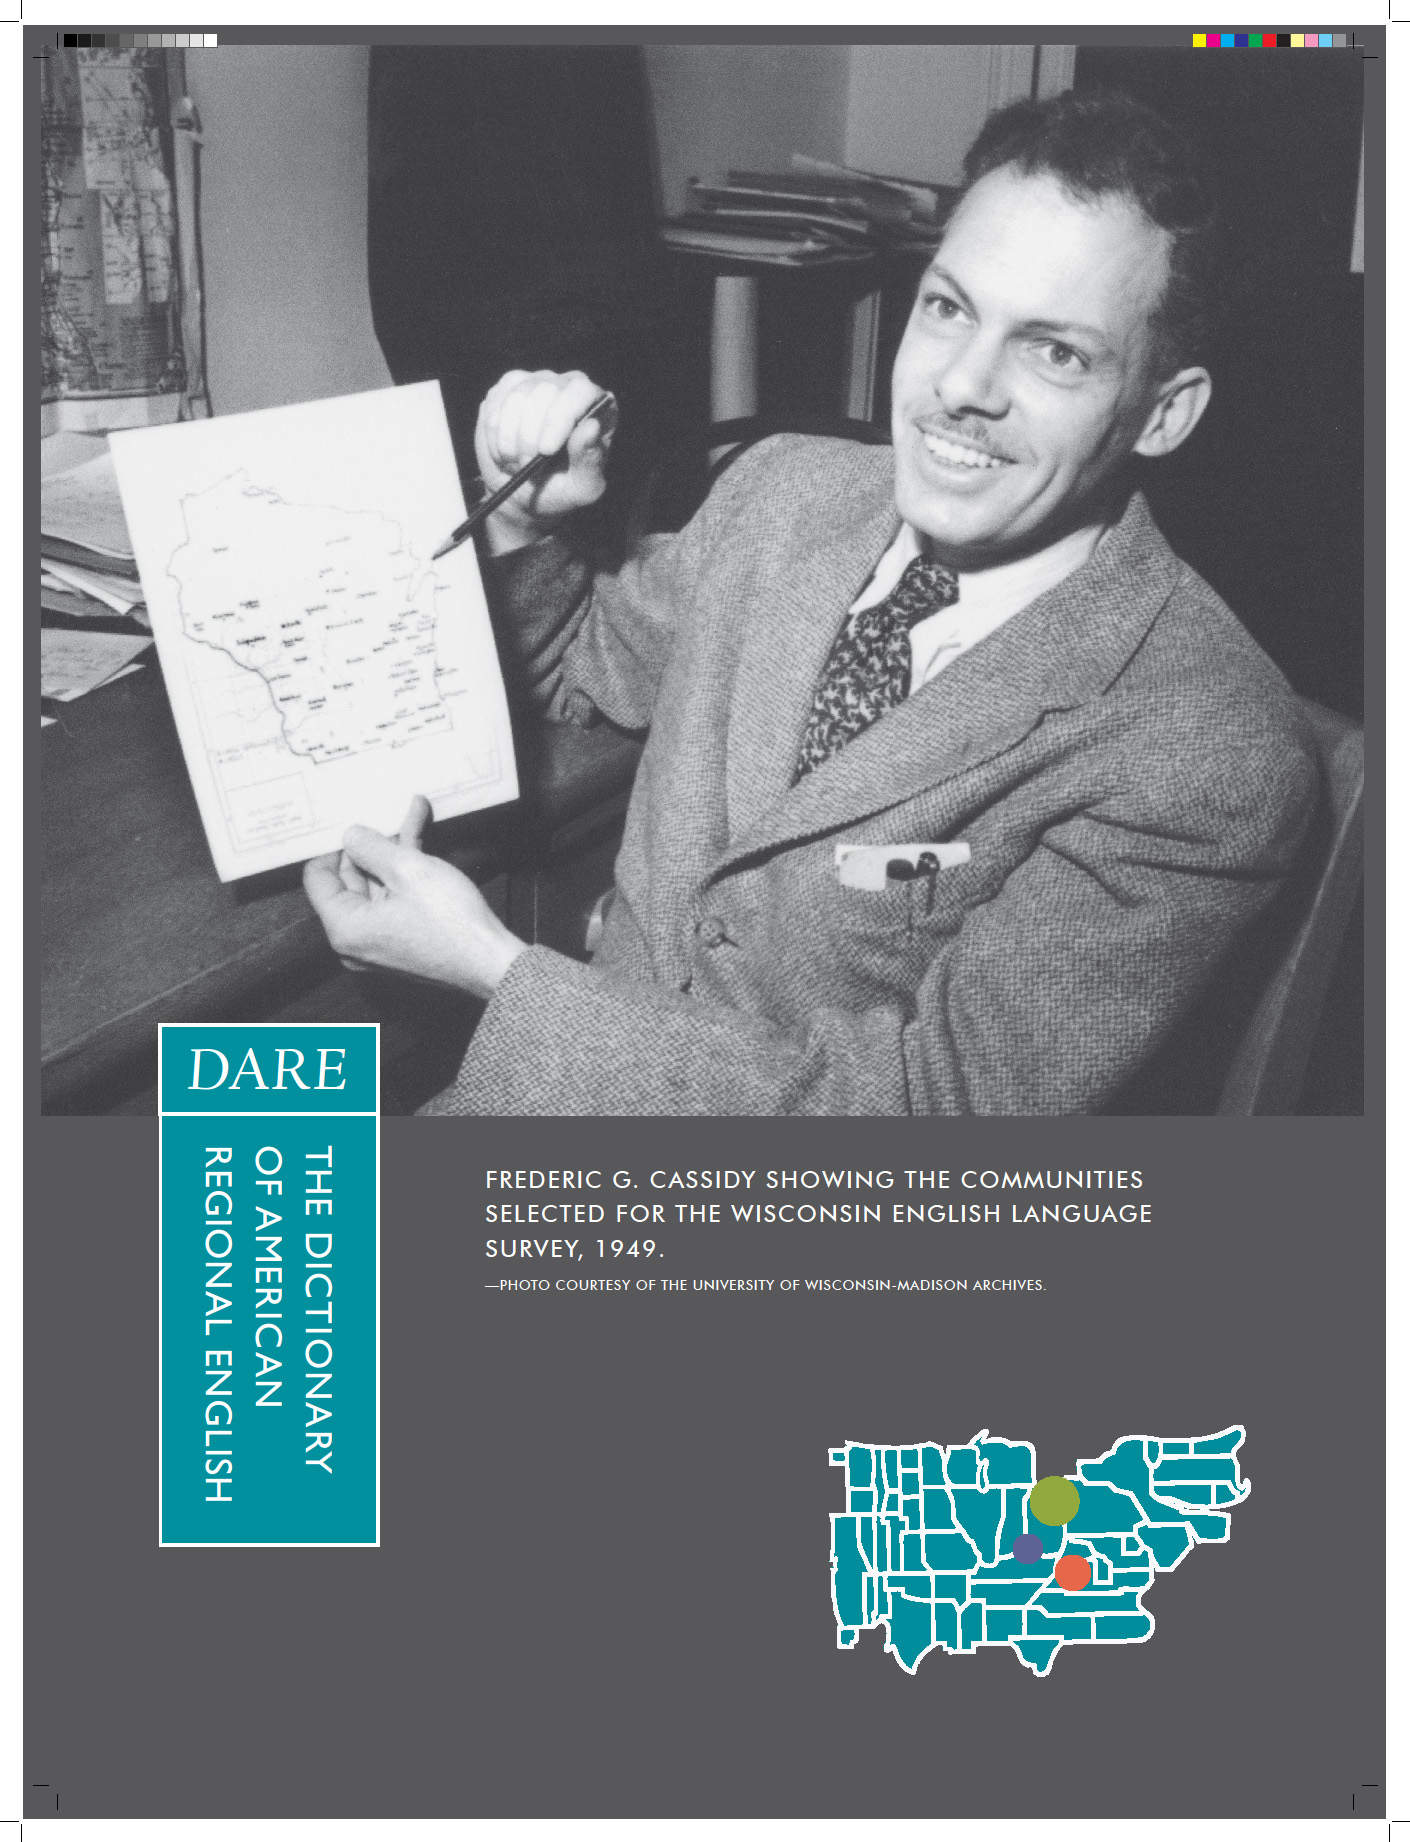 NEH poster FGC 1949 0